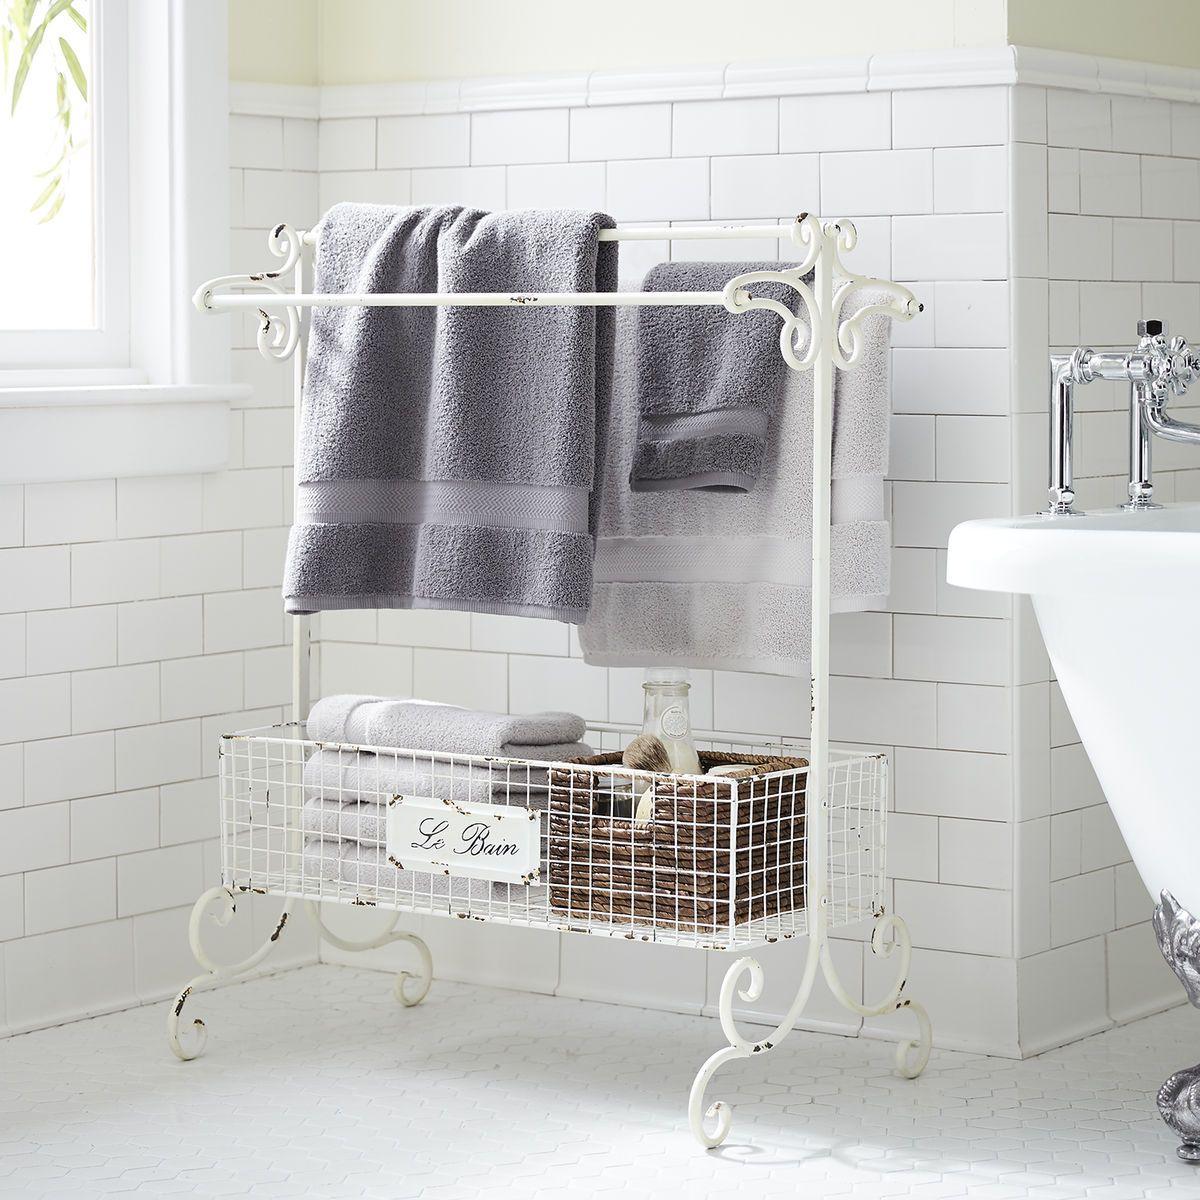 Pier 1 Imports Le Bain Antique White Towel Rack | Towels, Small ...